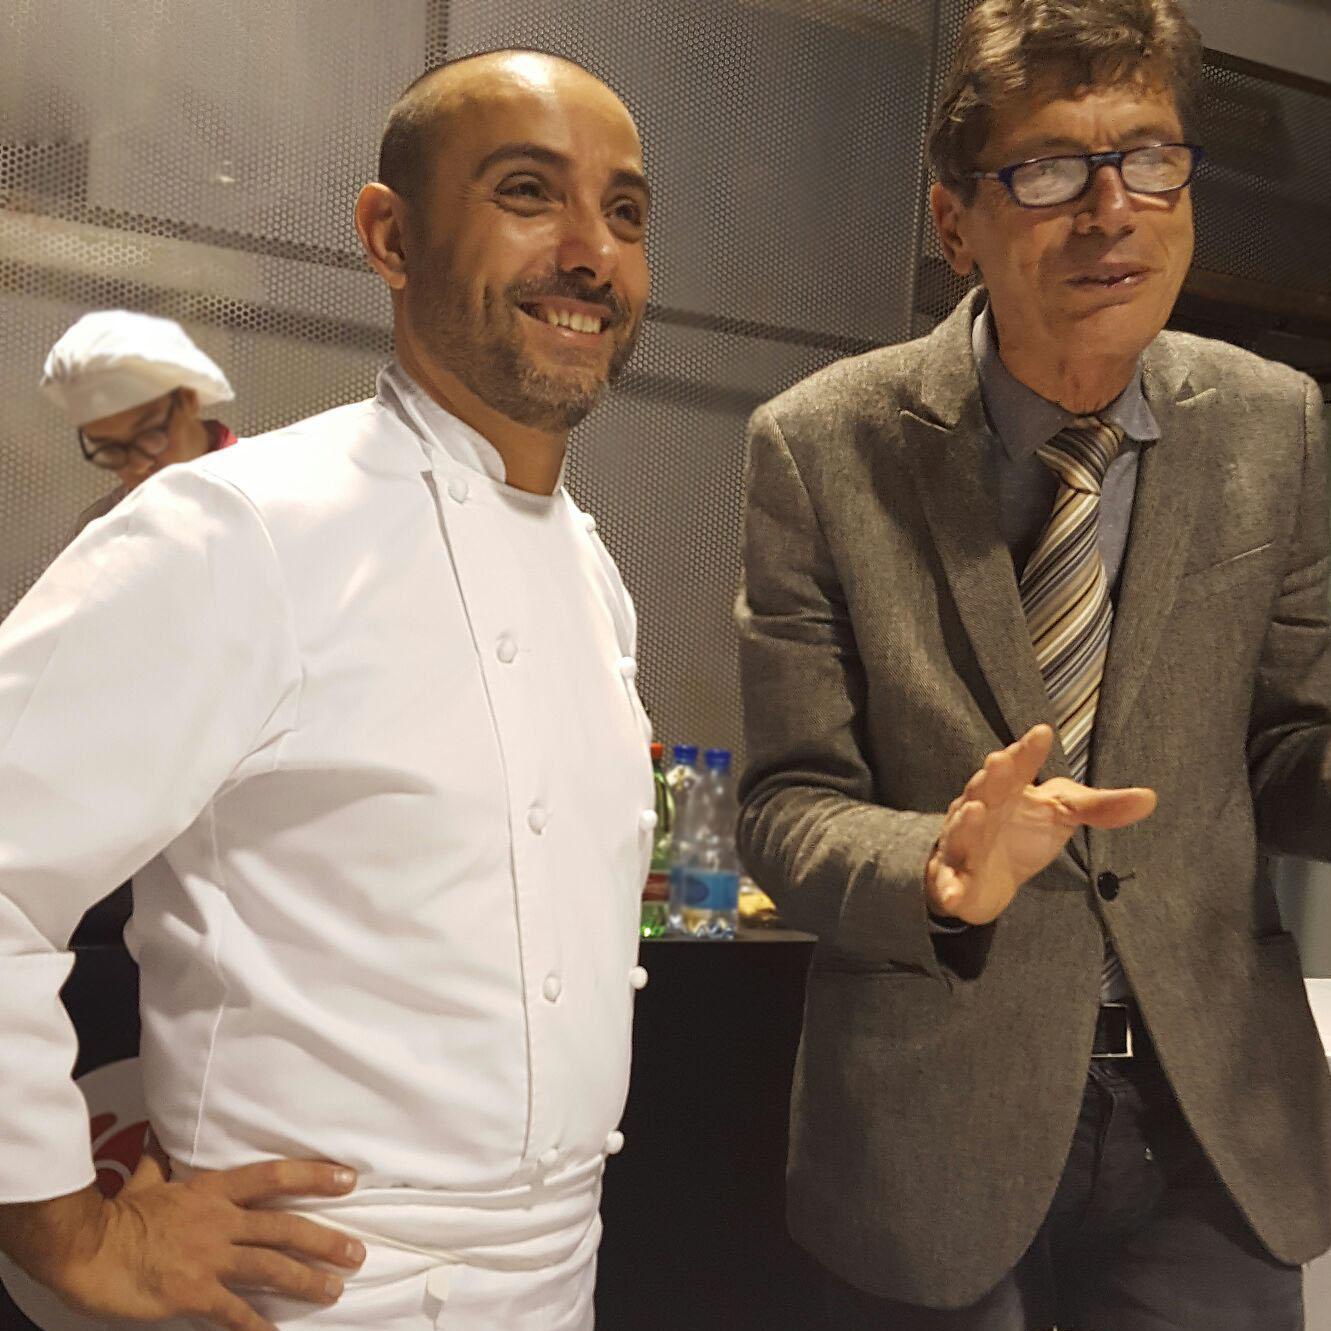 Enoteca Pinchiorri Riccardo Monco e Luigi Cremona